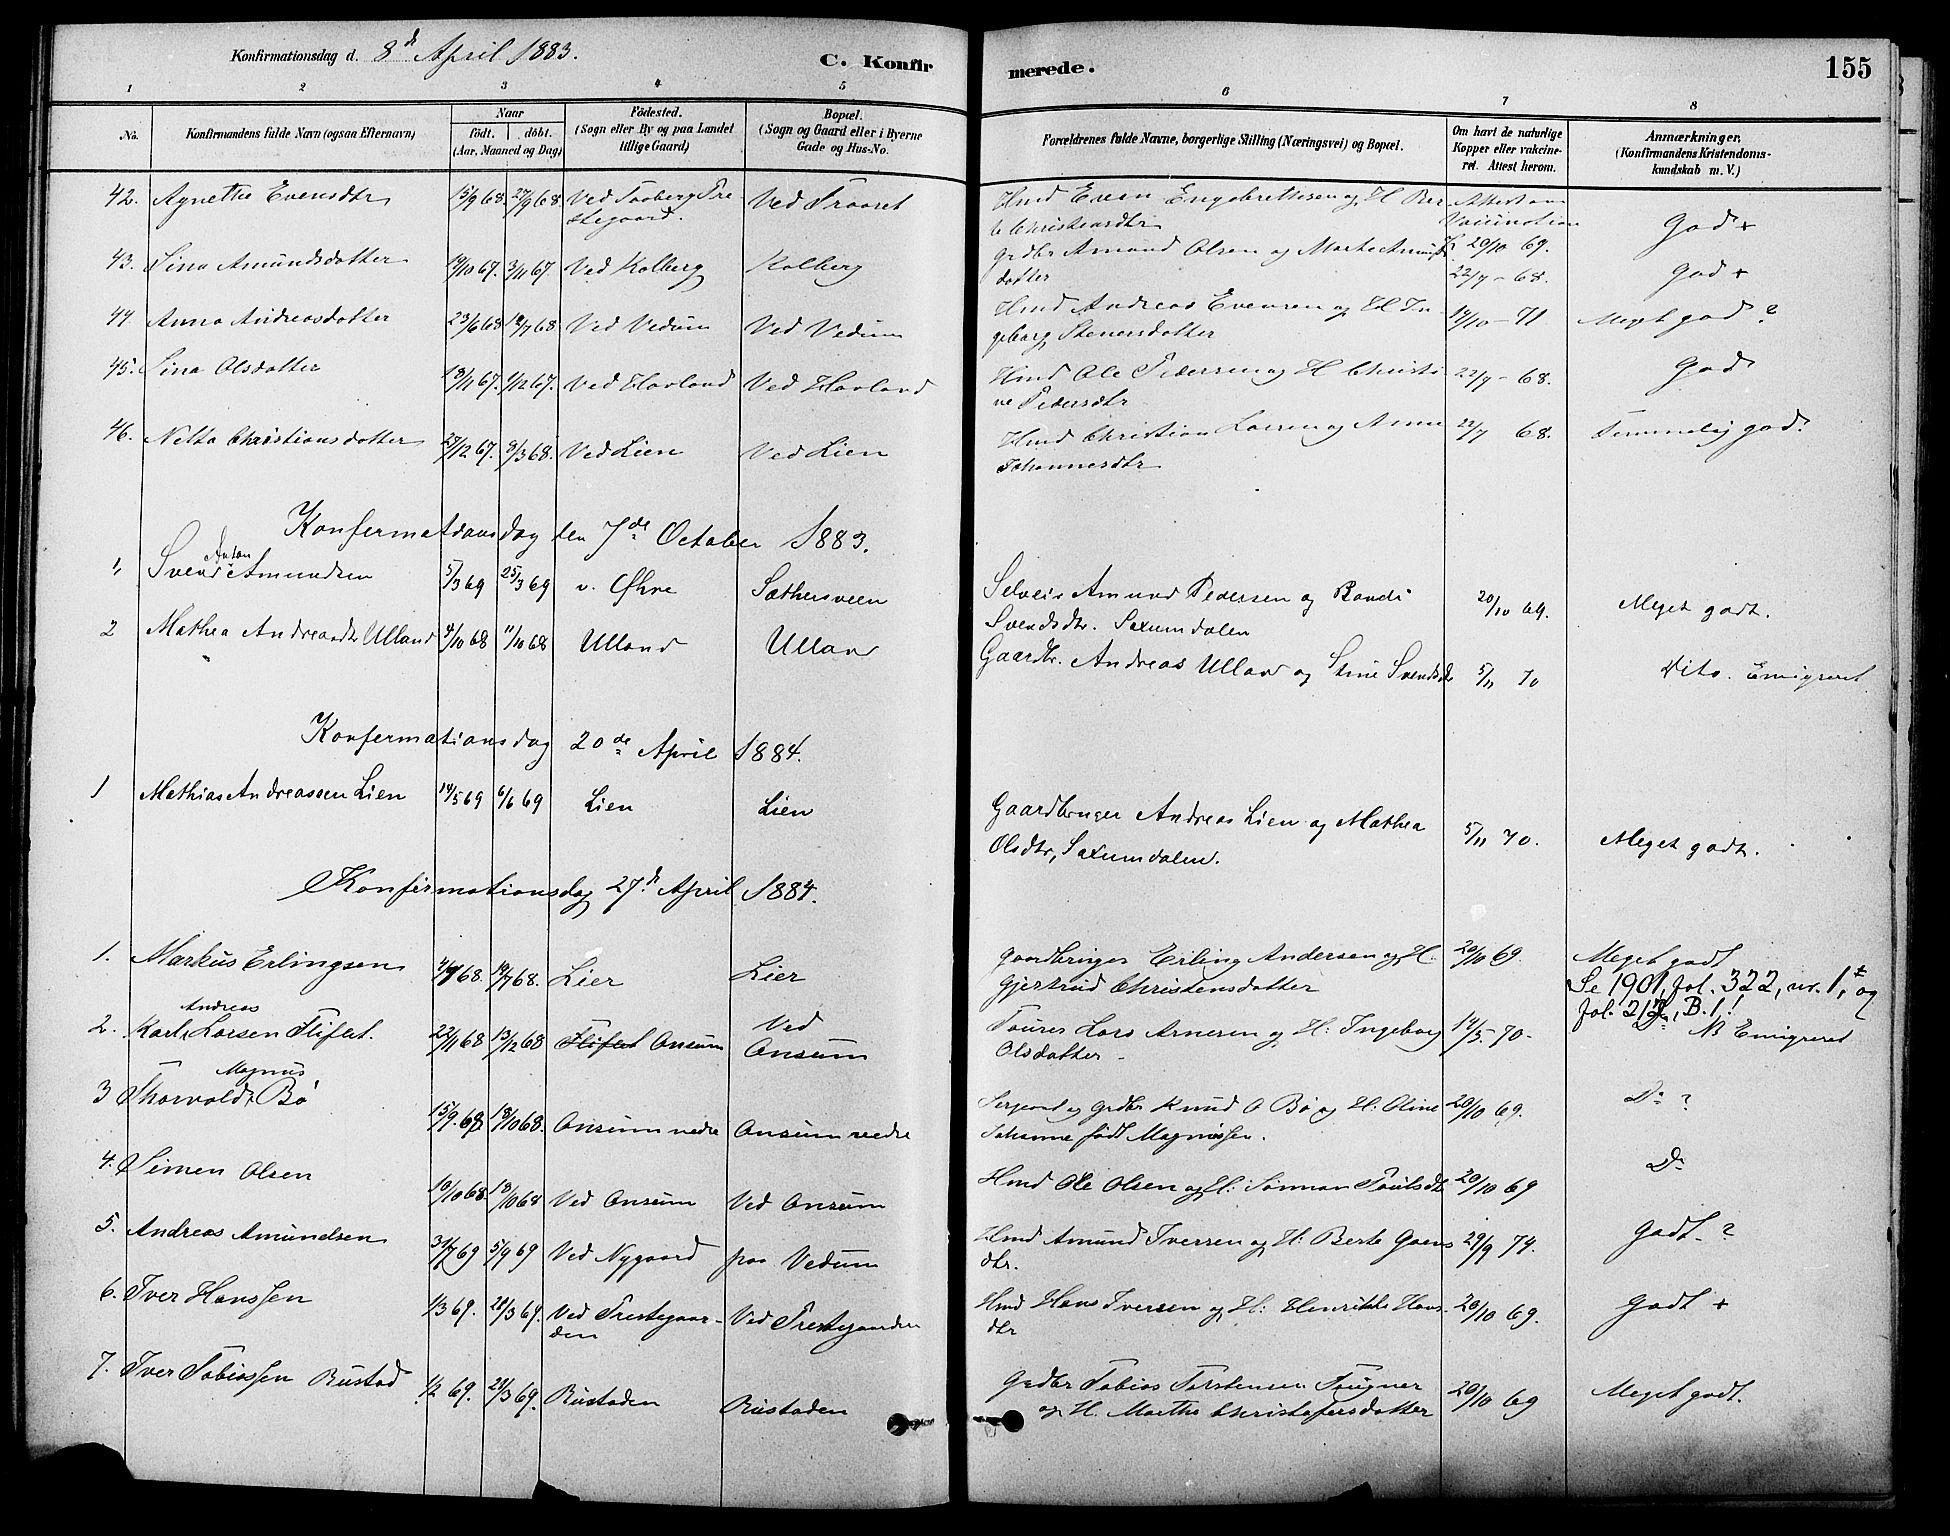 SAH, Fåberg prestekontor, Ministerialbok nr. 8, 1879-1898, s. 155